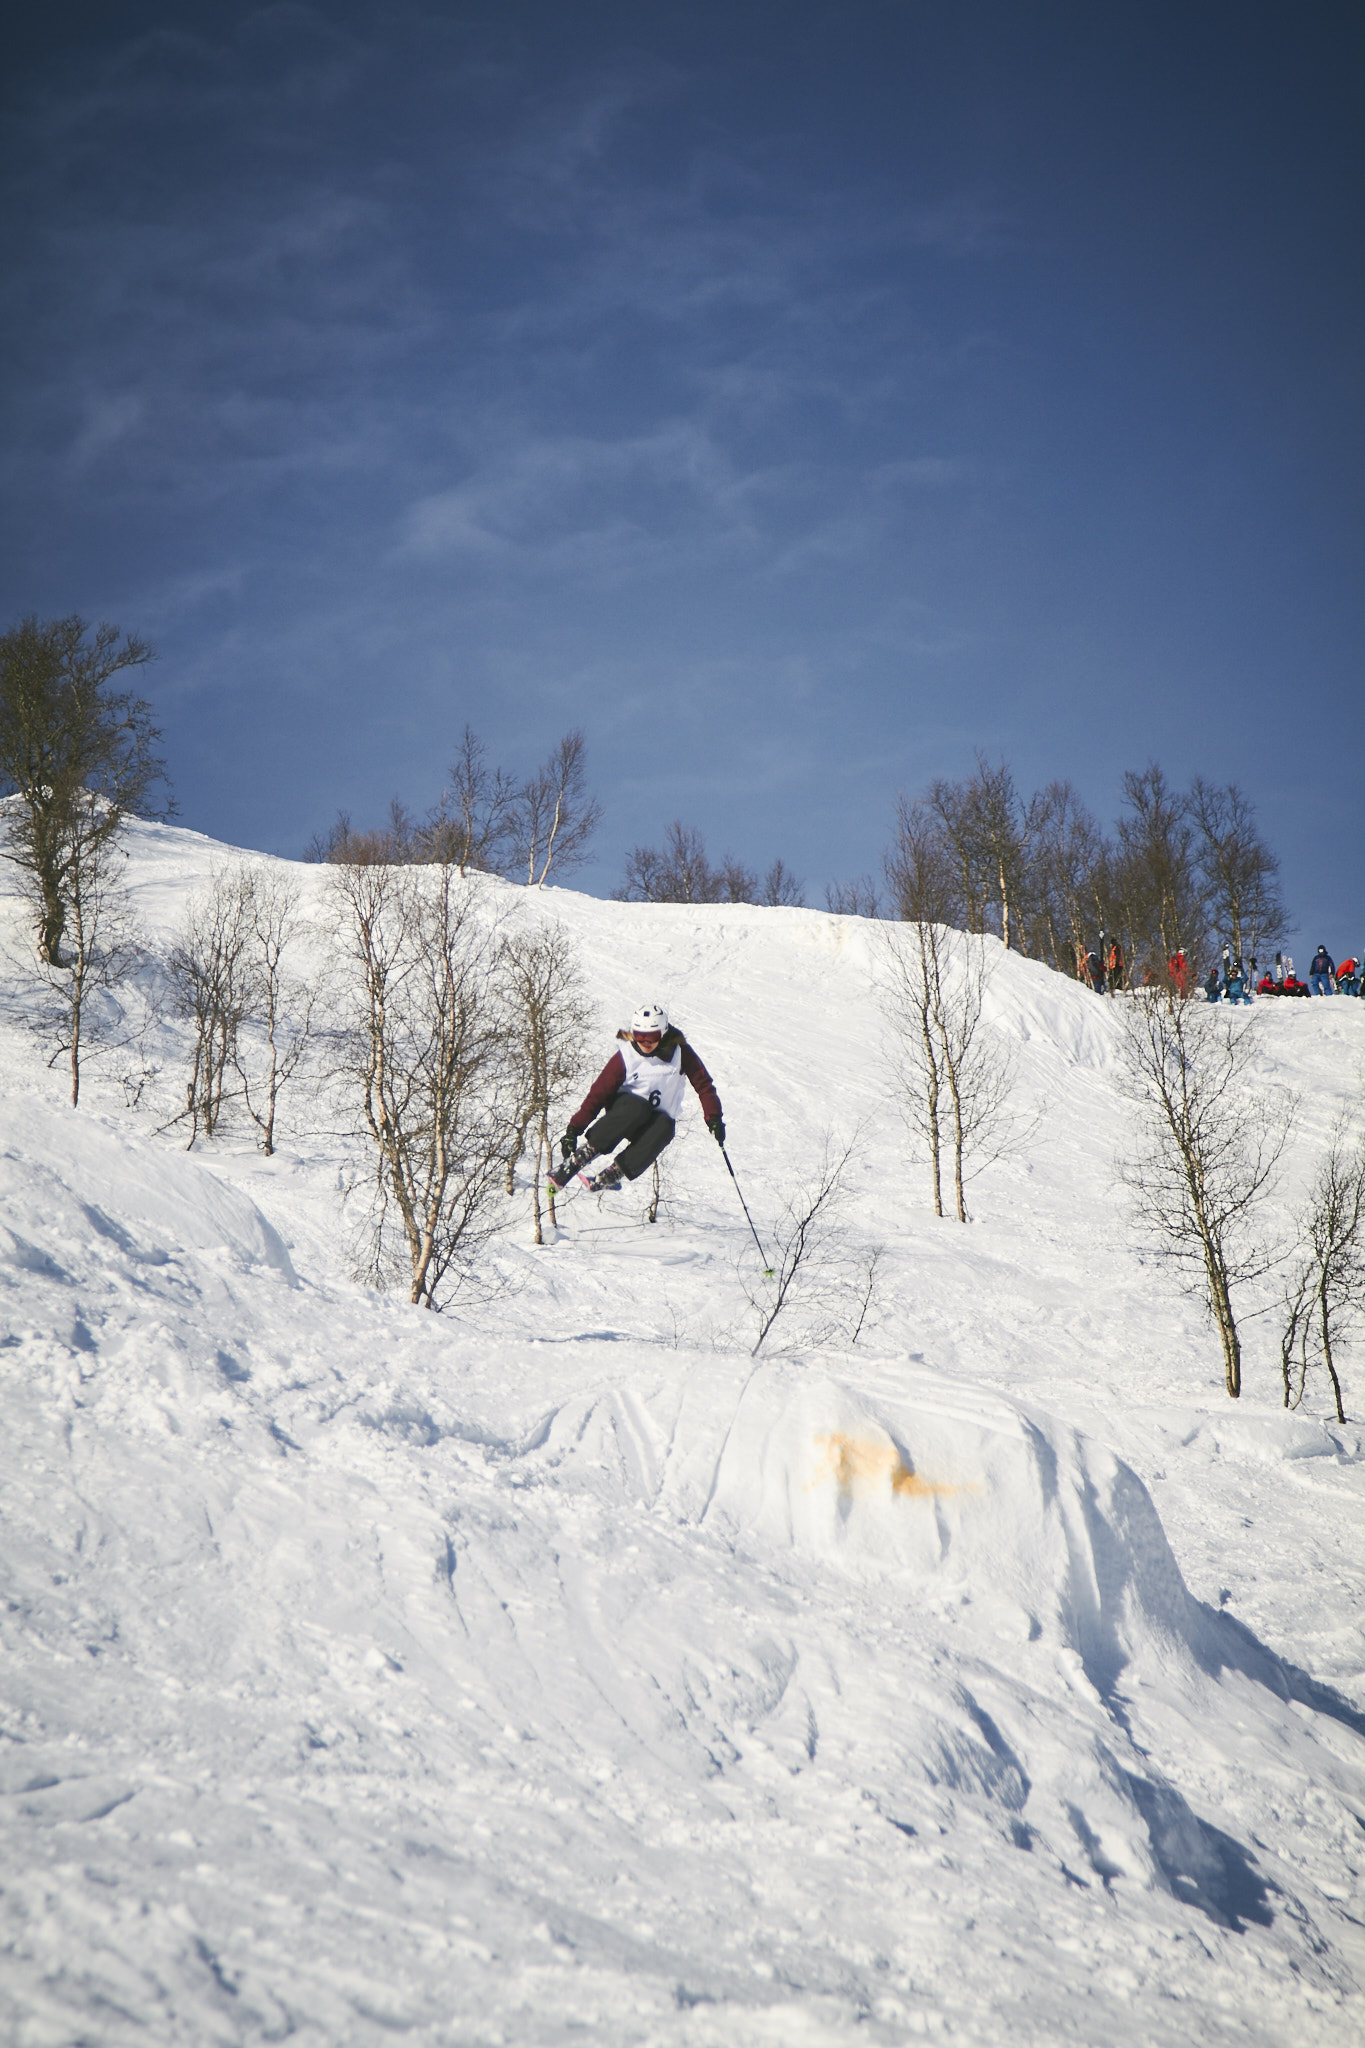 2018.02.22-Fjellsportfestival-RakkarOpen-PetterOlsen-001.jpg